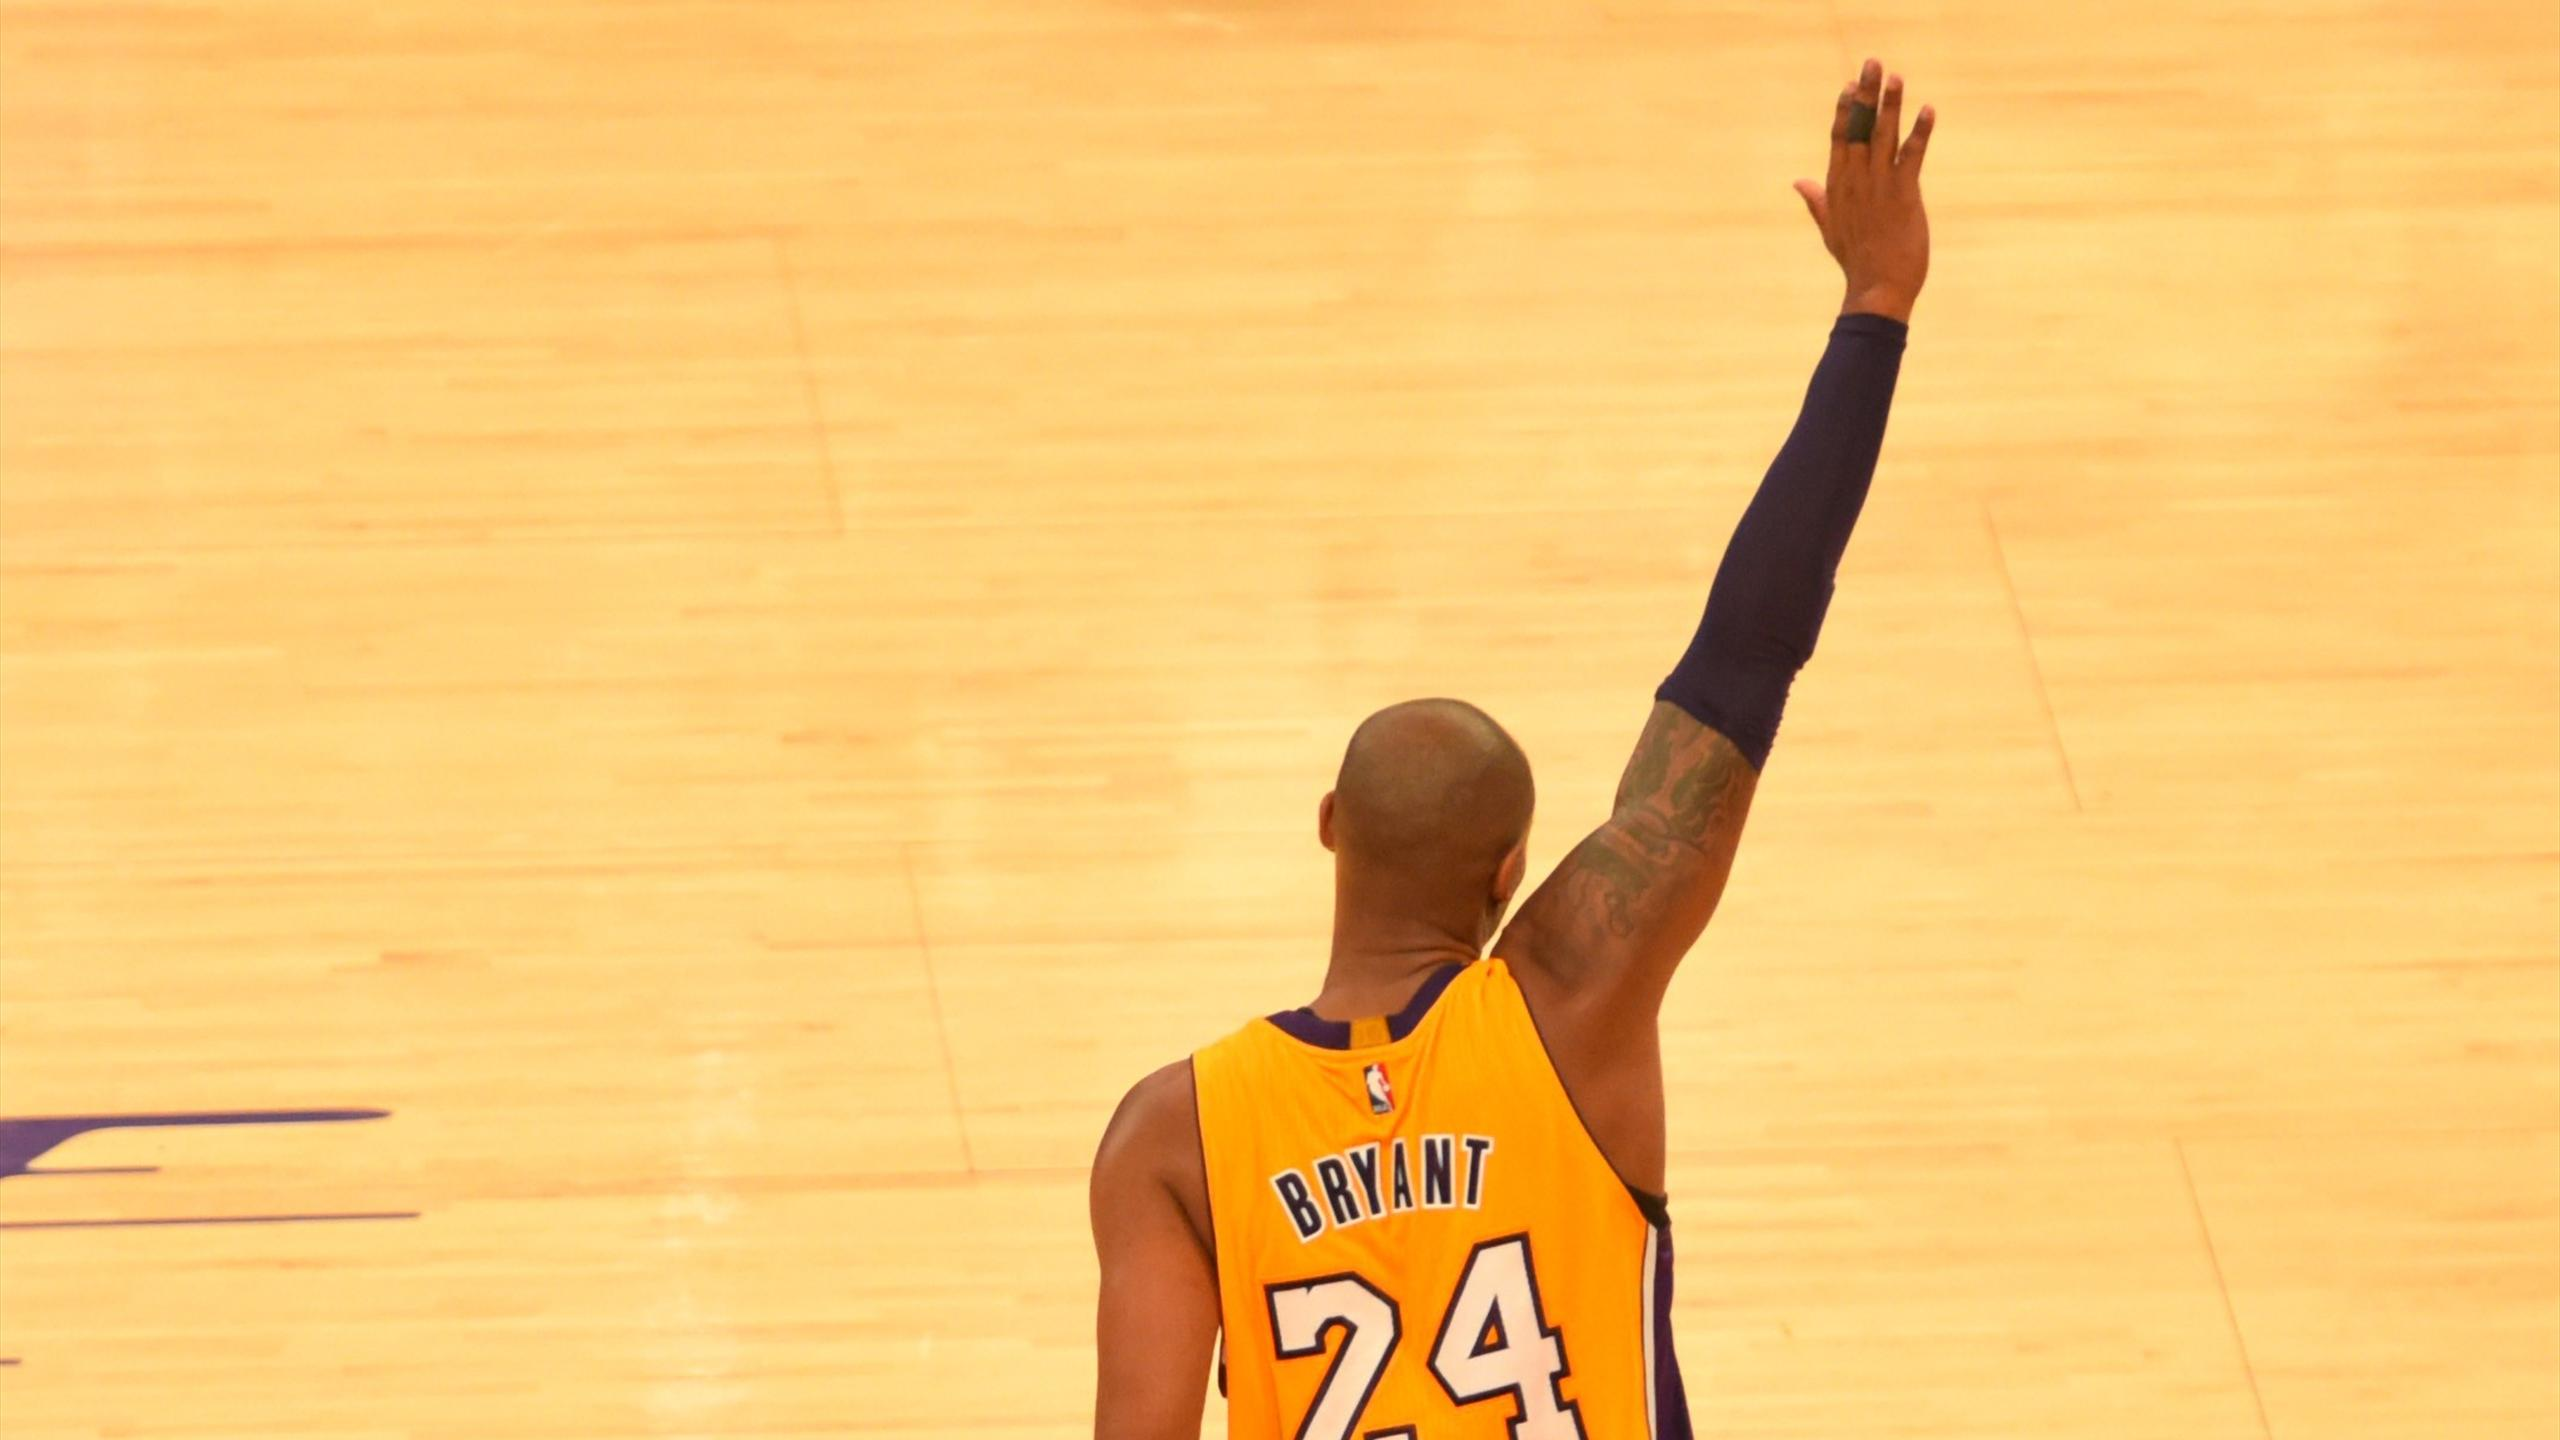 Kobe Bryant (Los Angeles Lakers) dit au revoir après son dernier match en NBA